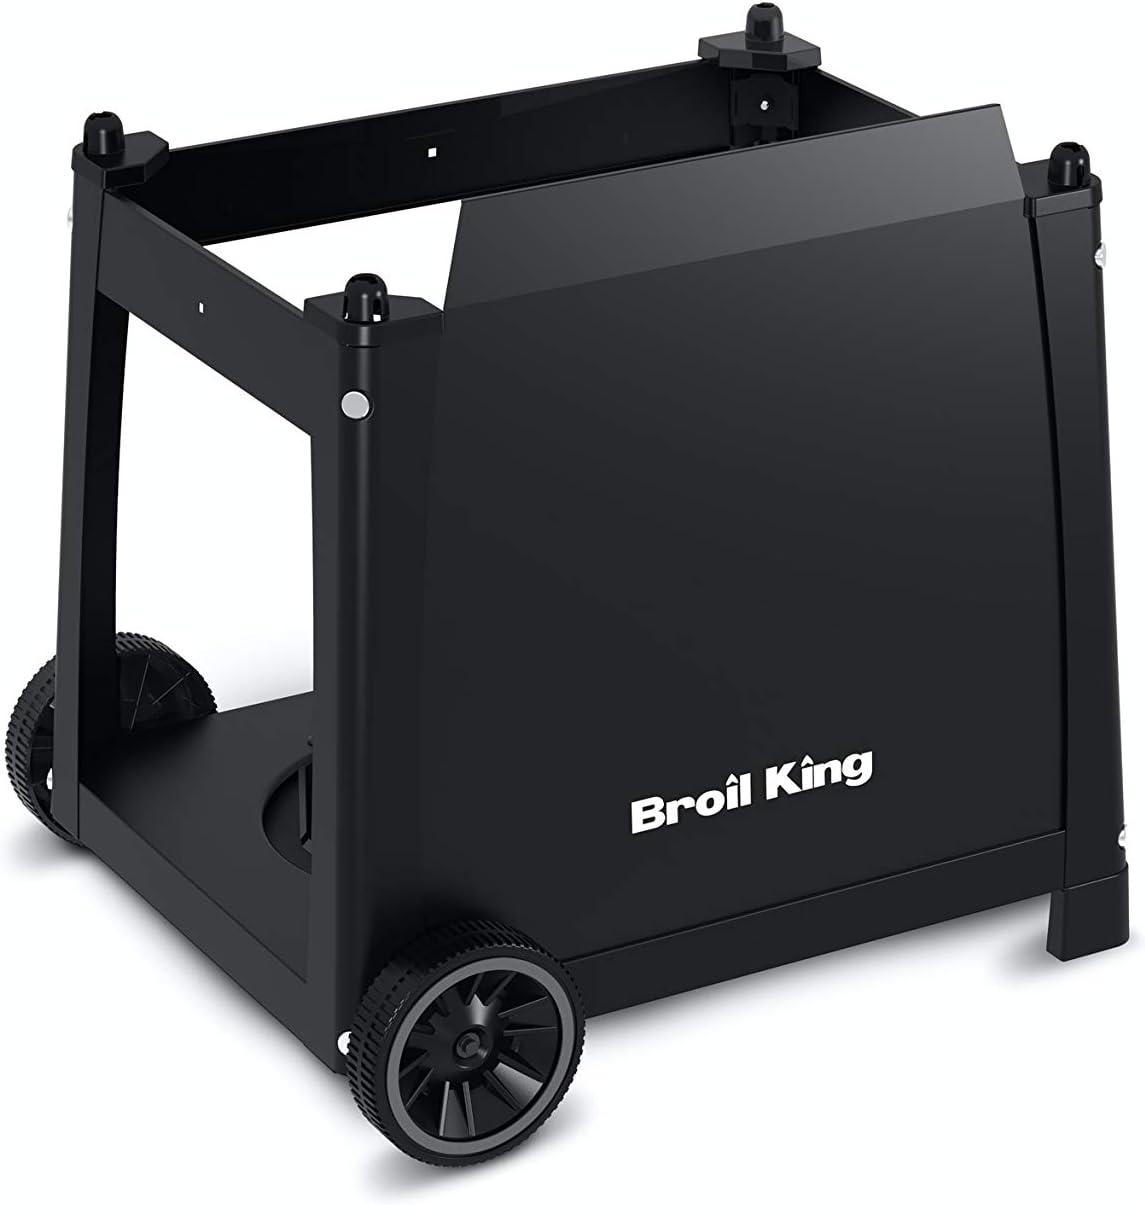 Broil King Porta-Chef Stationary Popular product Cart 320 Las Vegas Mall